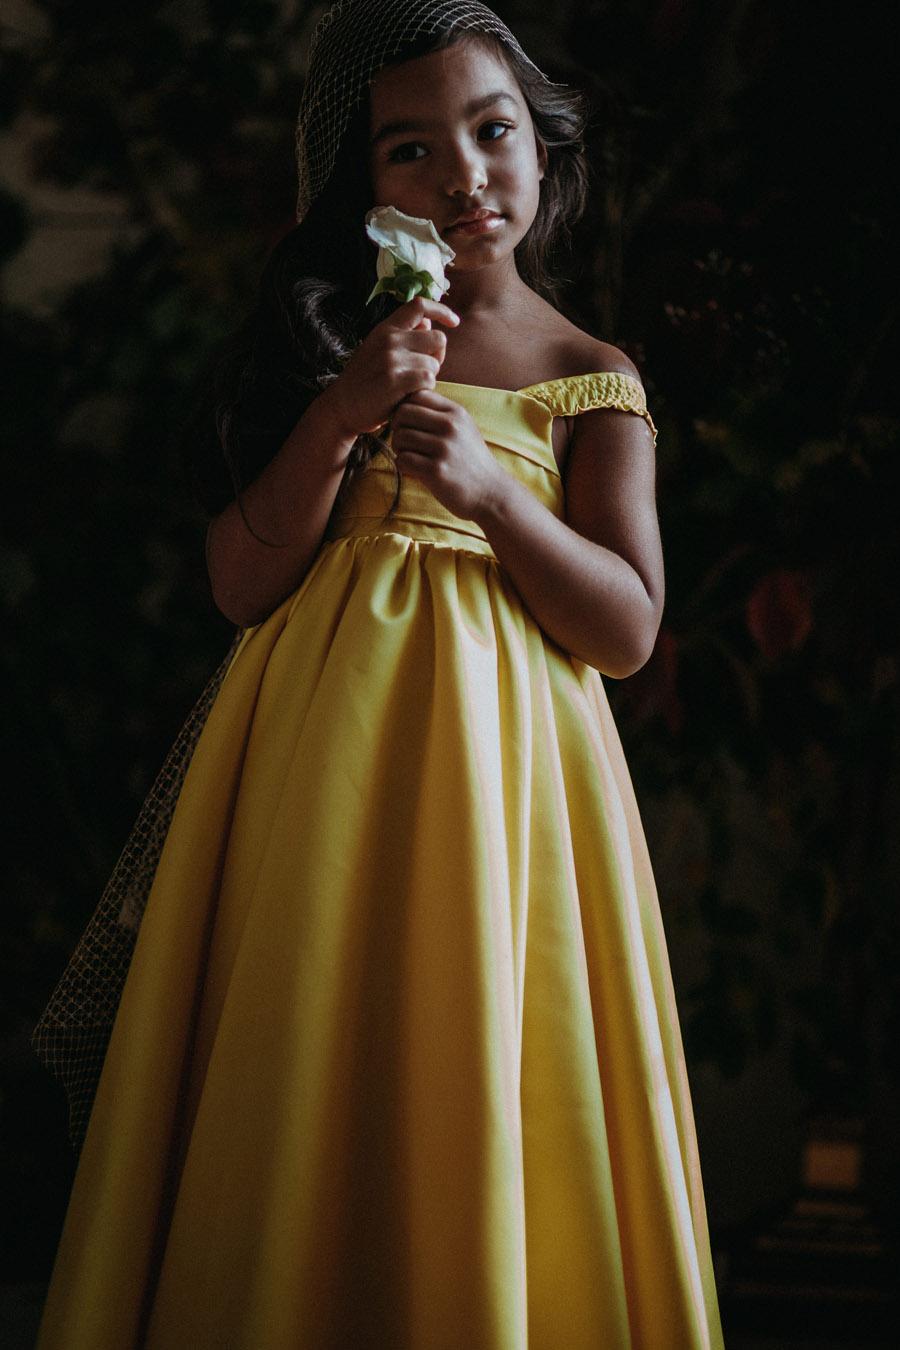 Sanyukta Shrestha autumn daydream bridal collection 2020 (7)